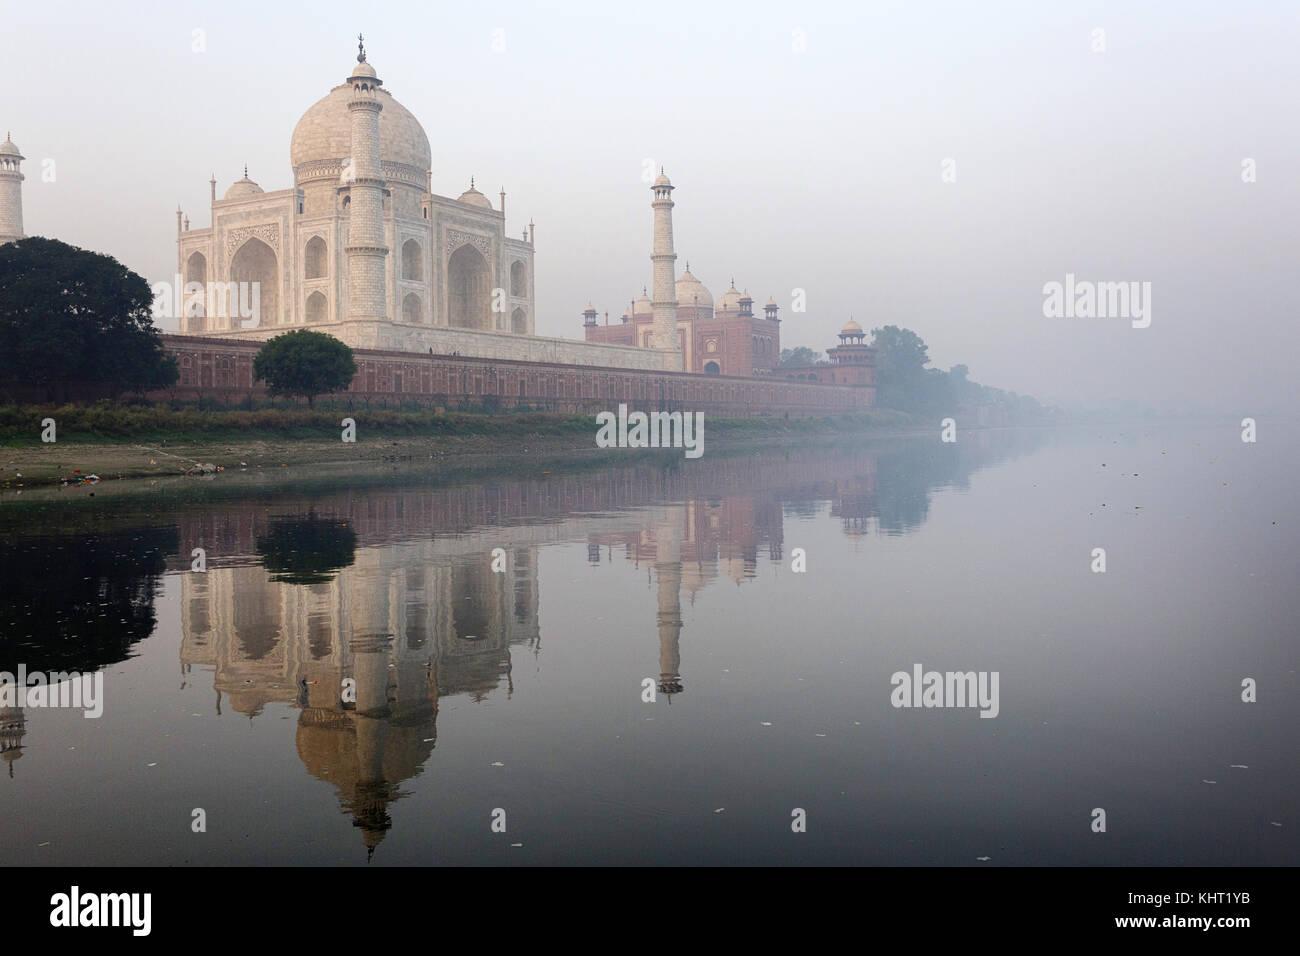 Morning reflection of Taj Mahal in Yamuna river, UNESCO World Heritage Site, Agra, Uttar Pradesh, India, Asia - Stock Image